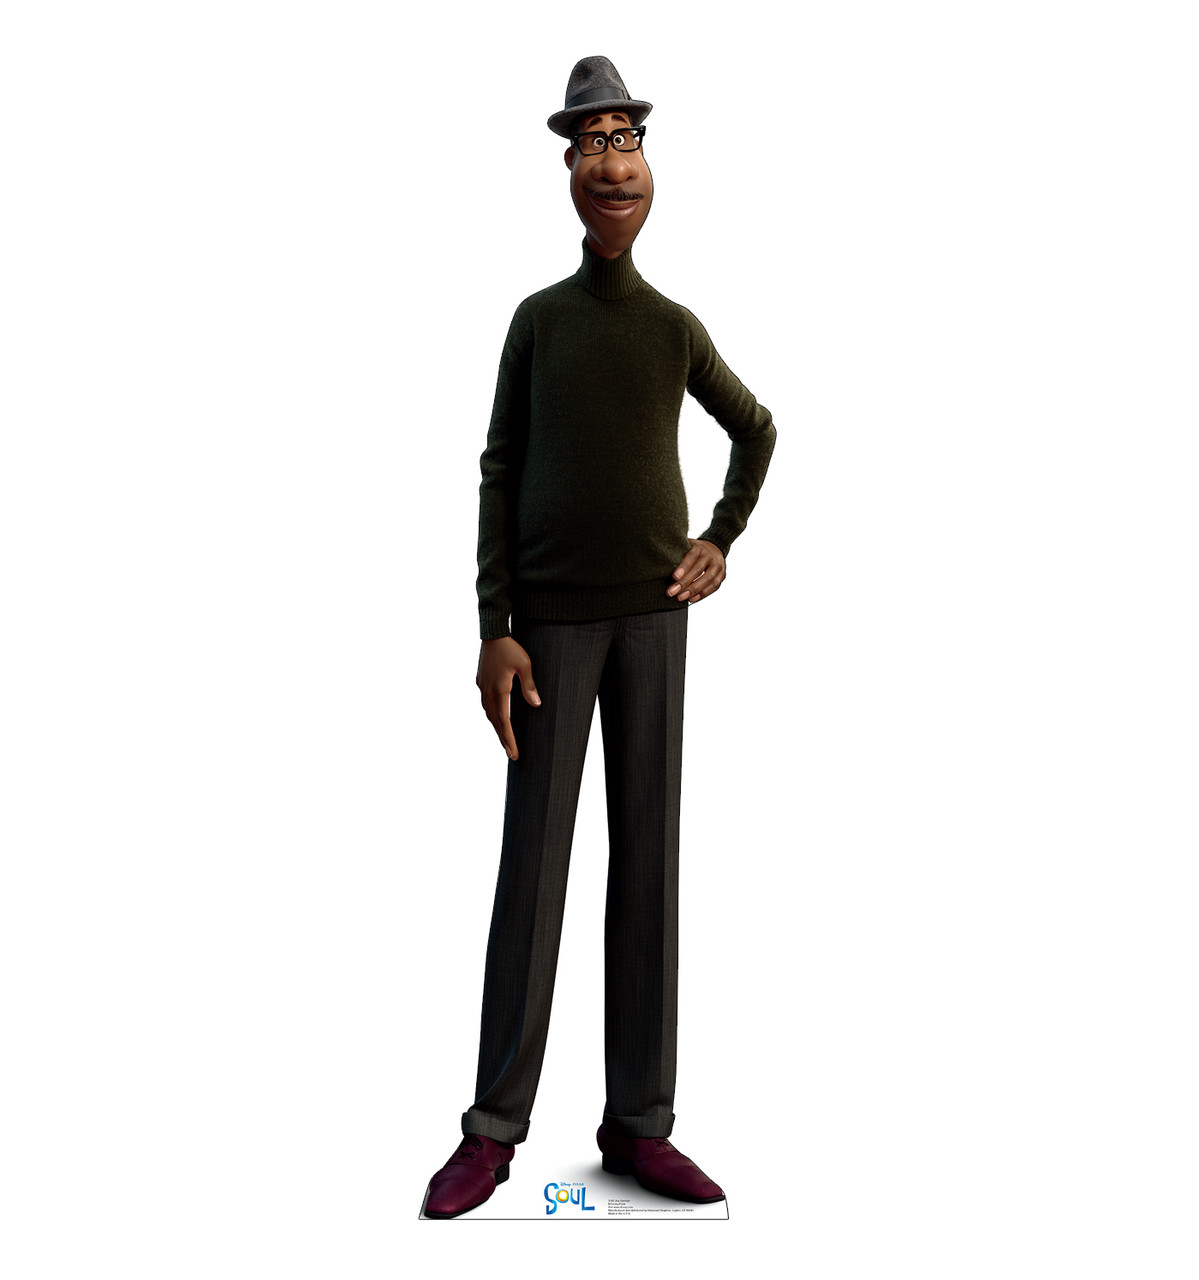 Life-size cardboard standee of Joe Gardner from Disney's Movie Soul.